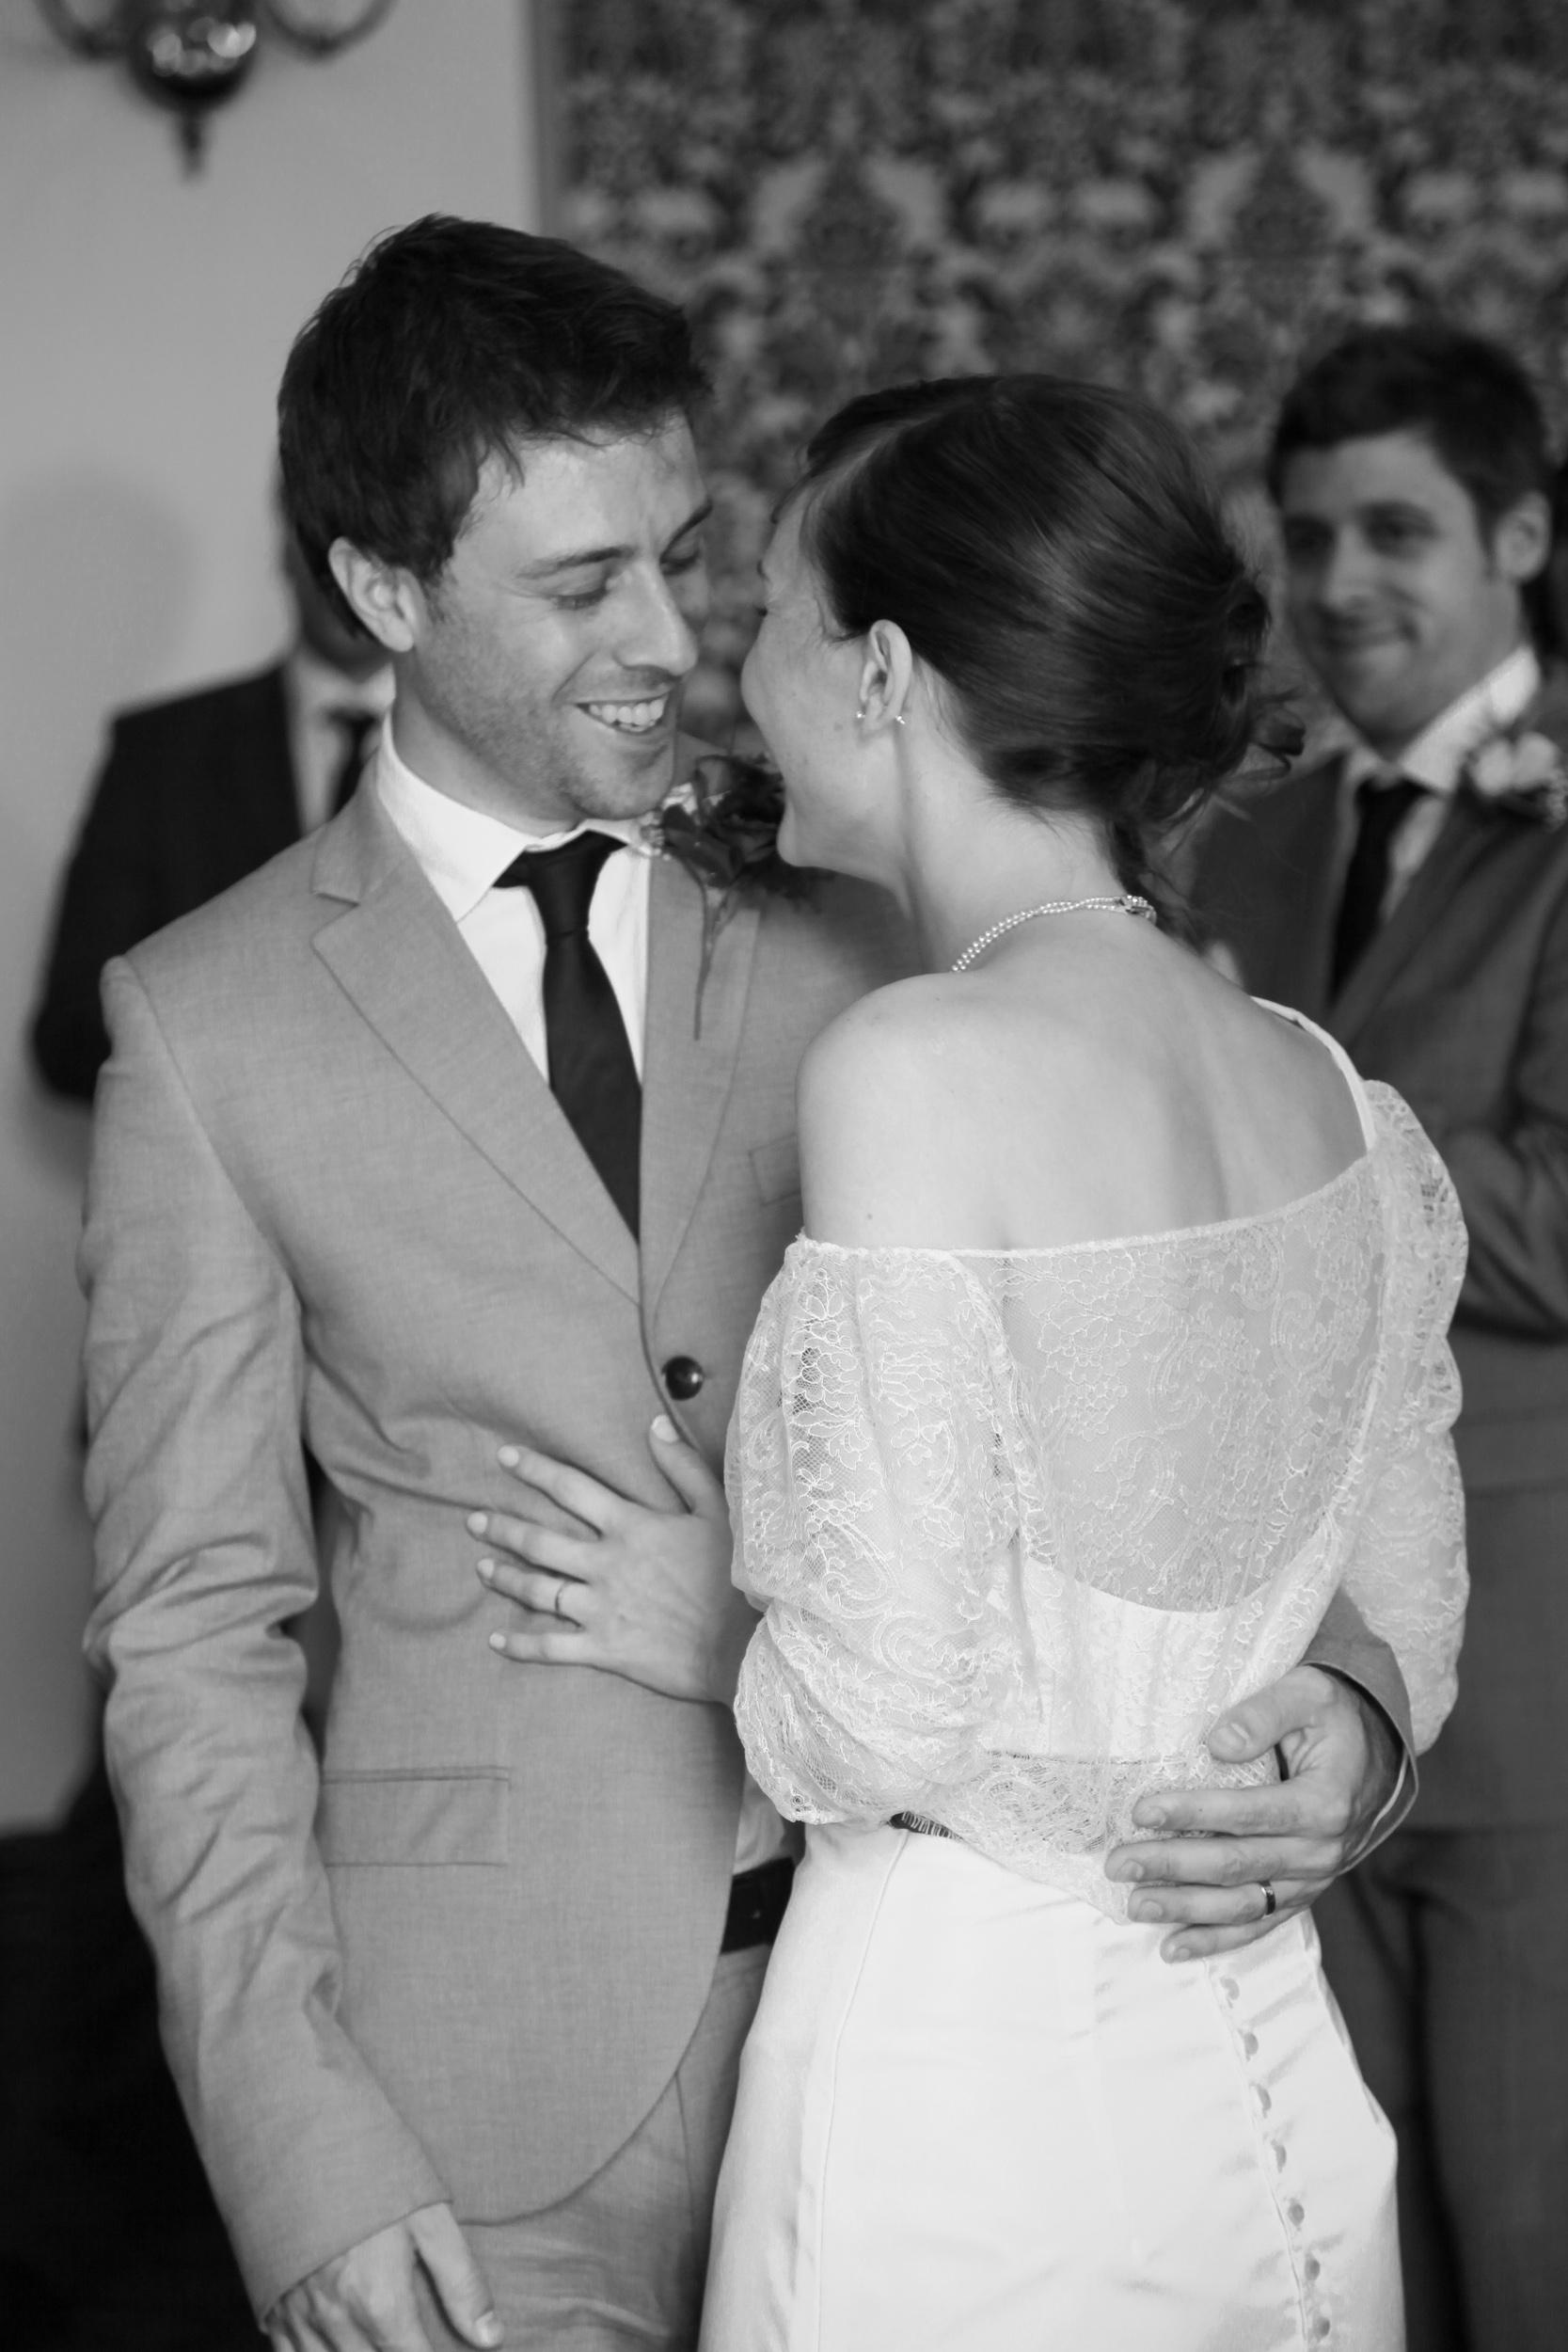 Alexandra-bespoke-wedding-dress-Kate-Beaumont-9.jpg